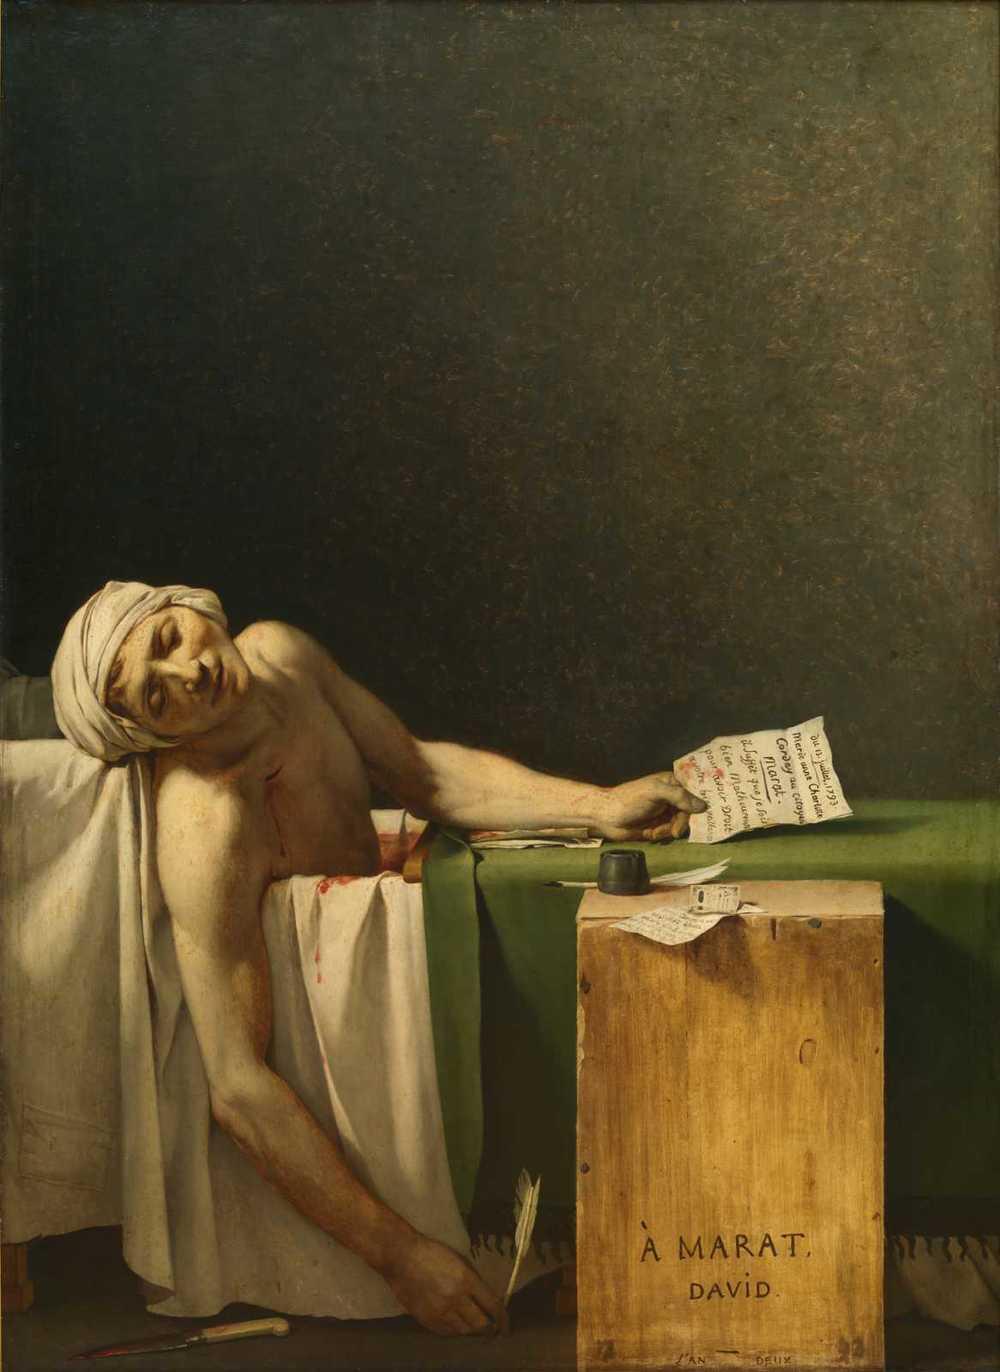 David, Death of Marat